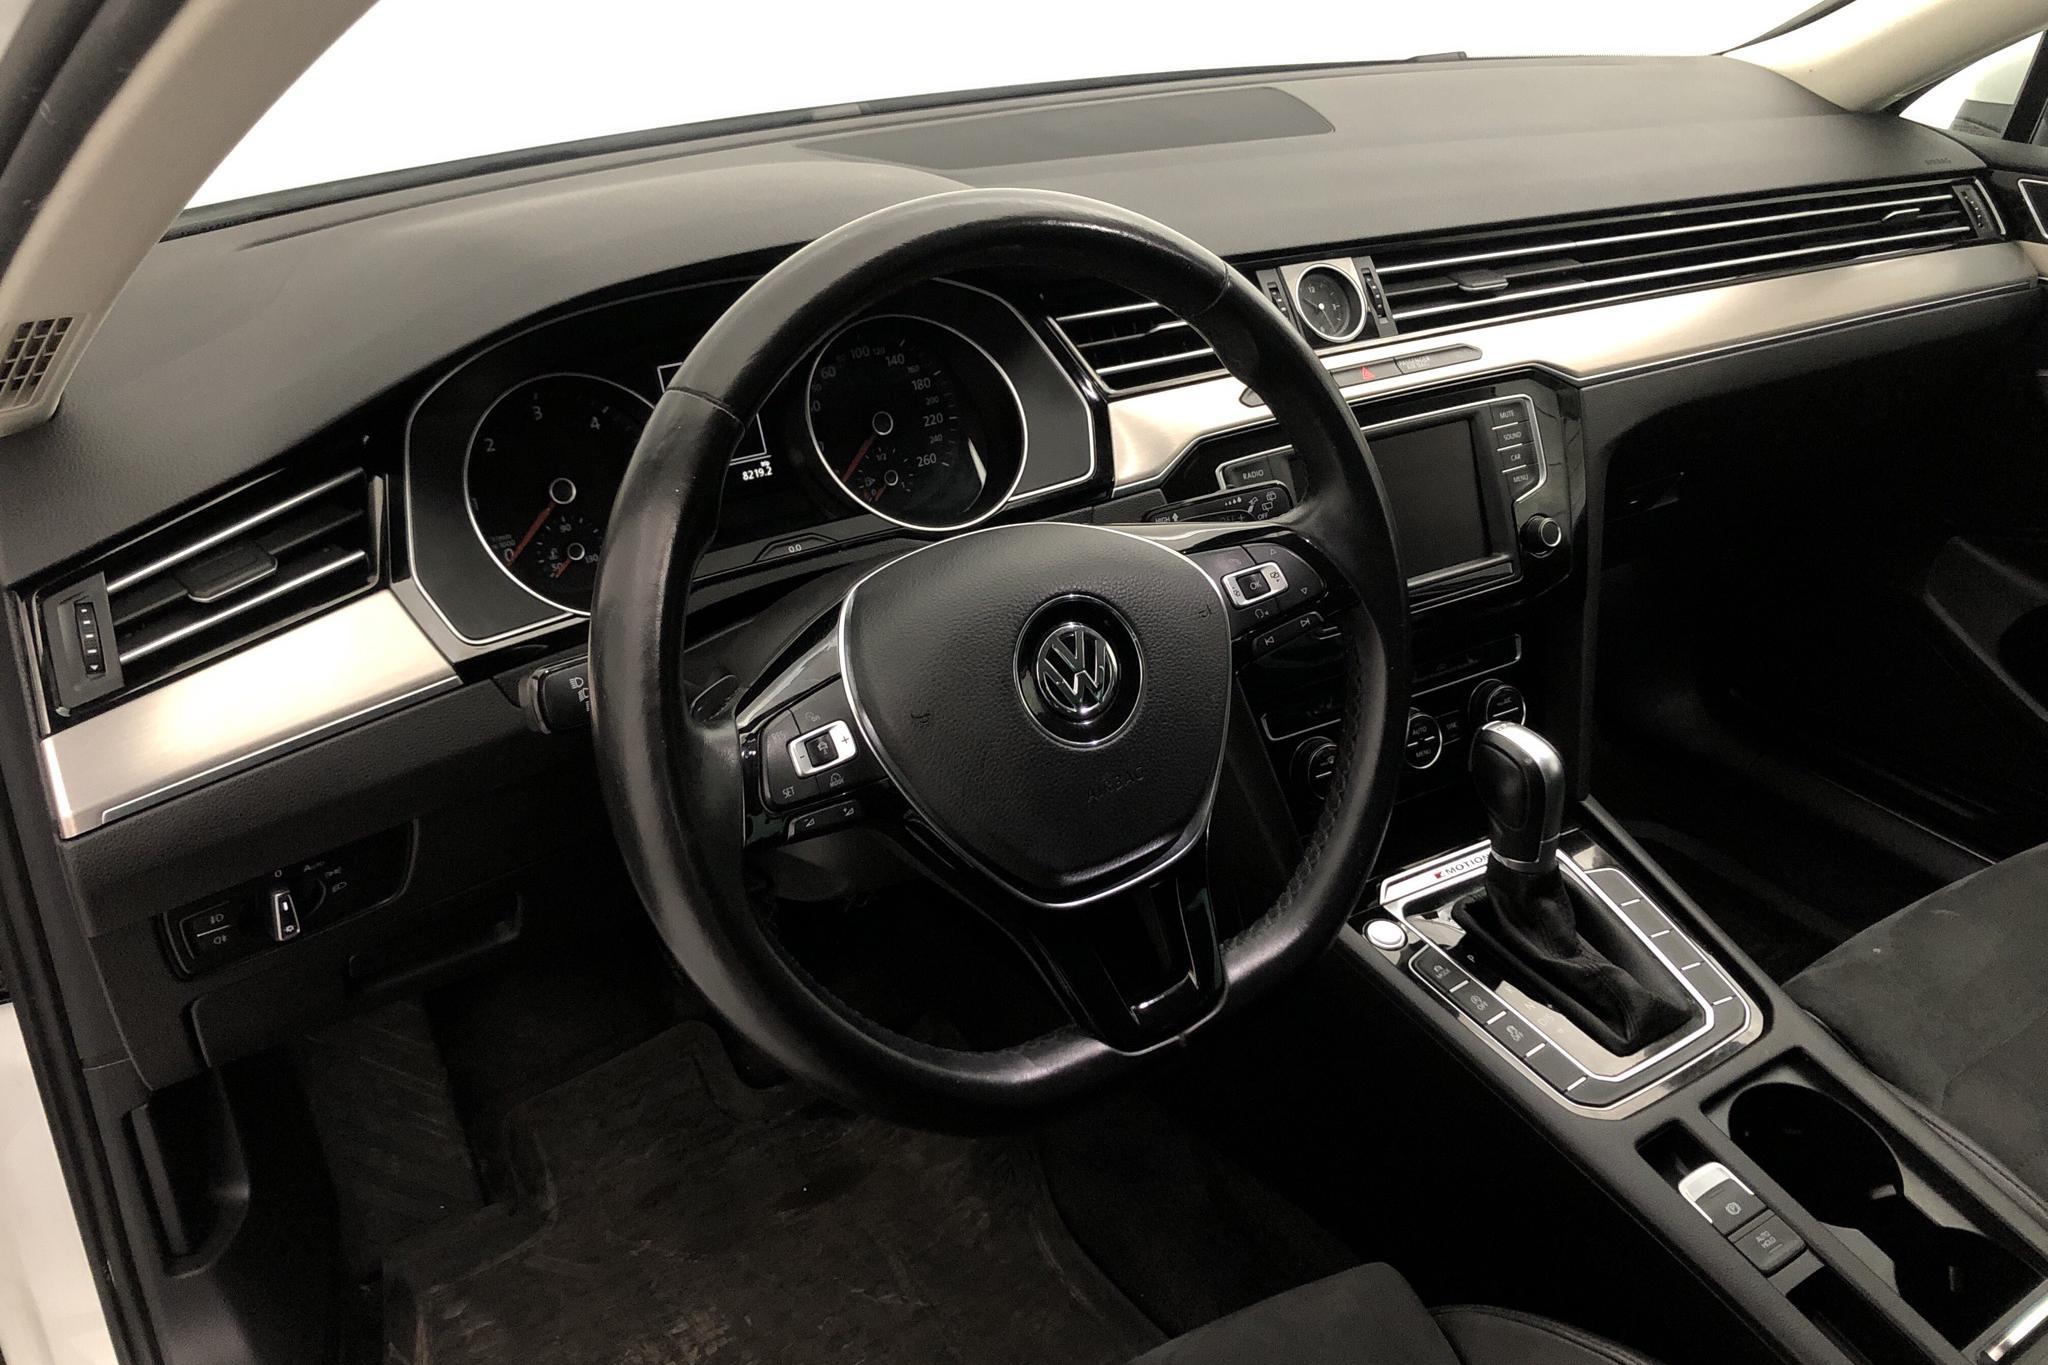 VW Passat 2.0 TDI Sportscombi 4MOTION (190hk) - 121 370 km - Automatic - white - 2016